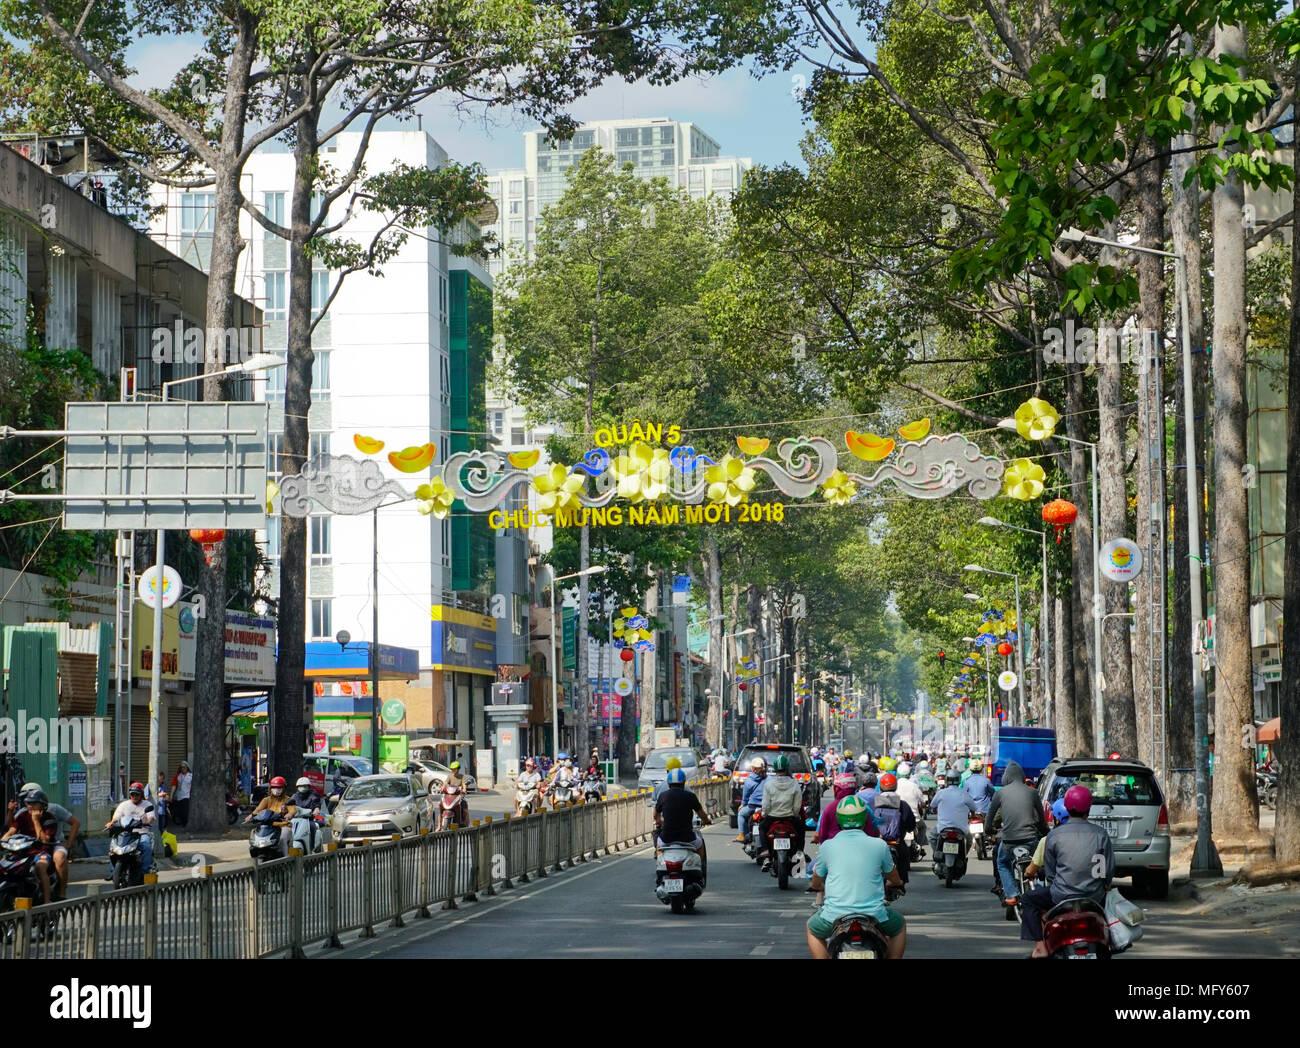 Duong Tran Hung Dao Street Chinatown Business Ho Chi Minh City Saigon Vietnam Stock Photo Alamy